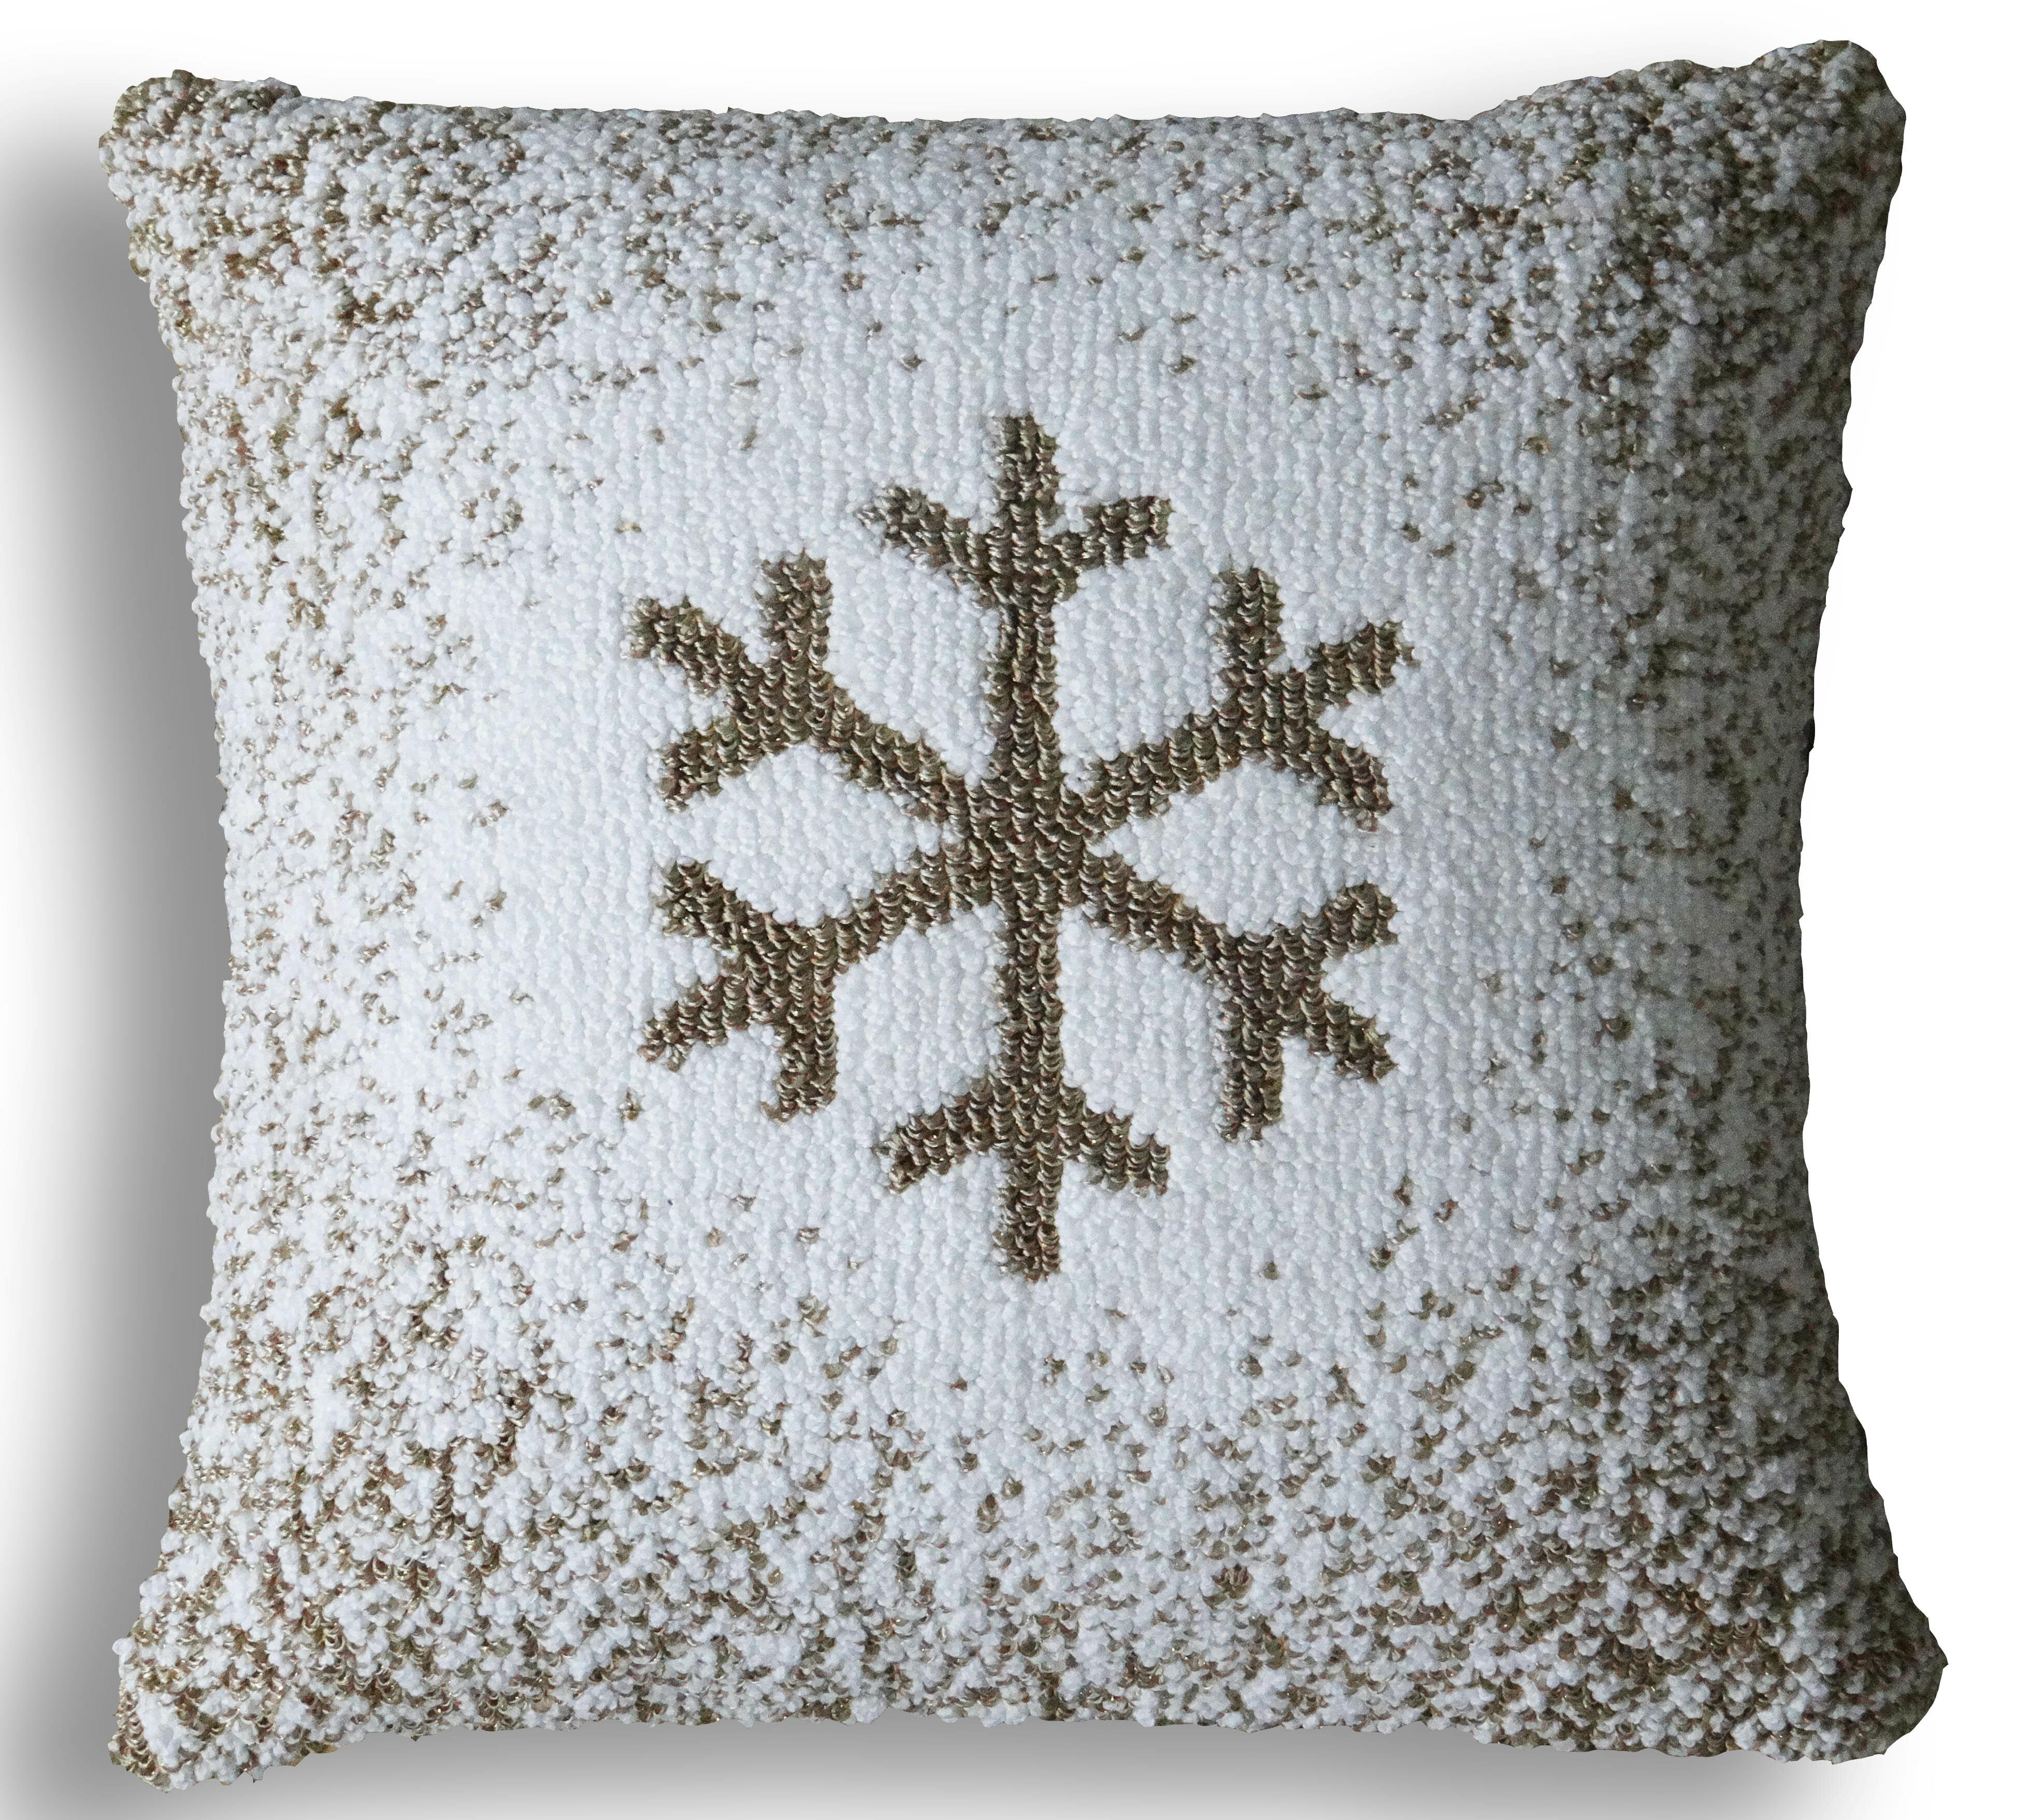 The Holiday Aisle Munoz Snowflake Pillow Cover Reviews Wayfair